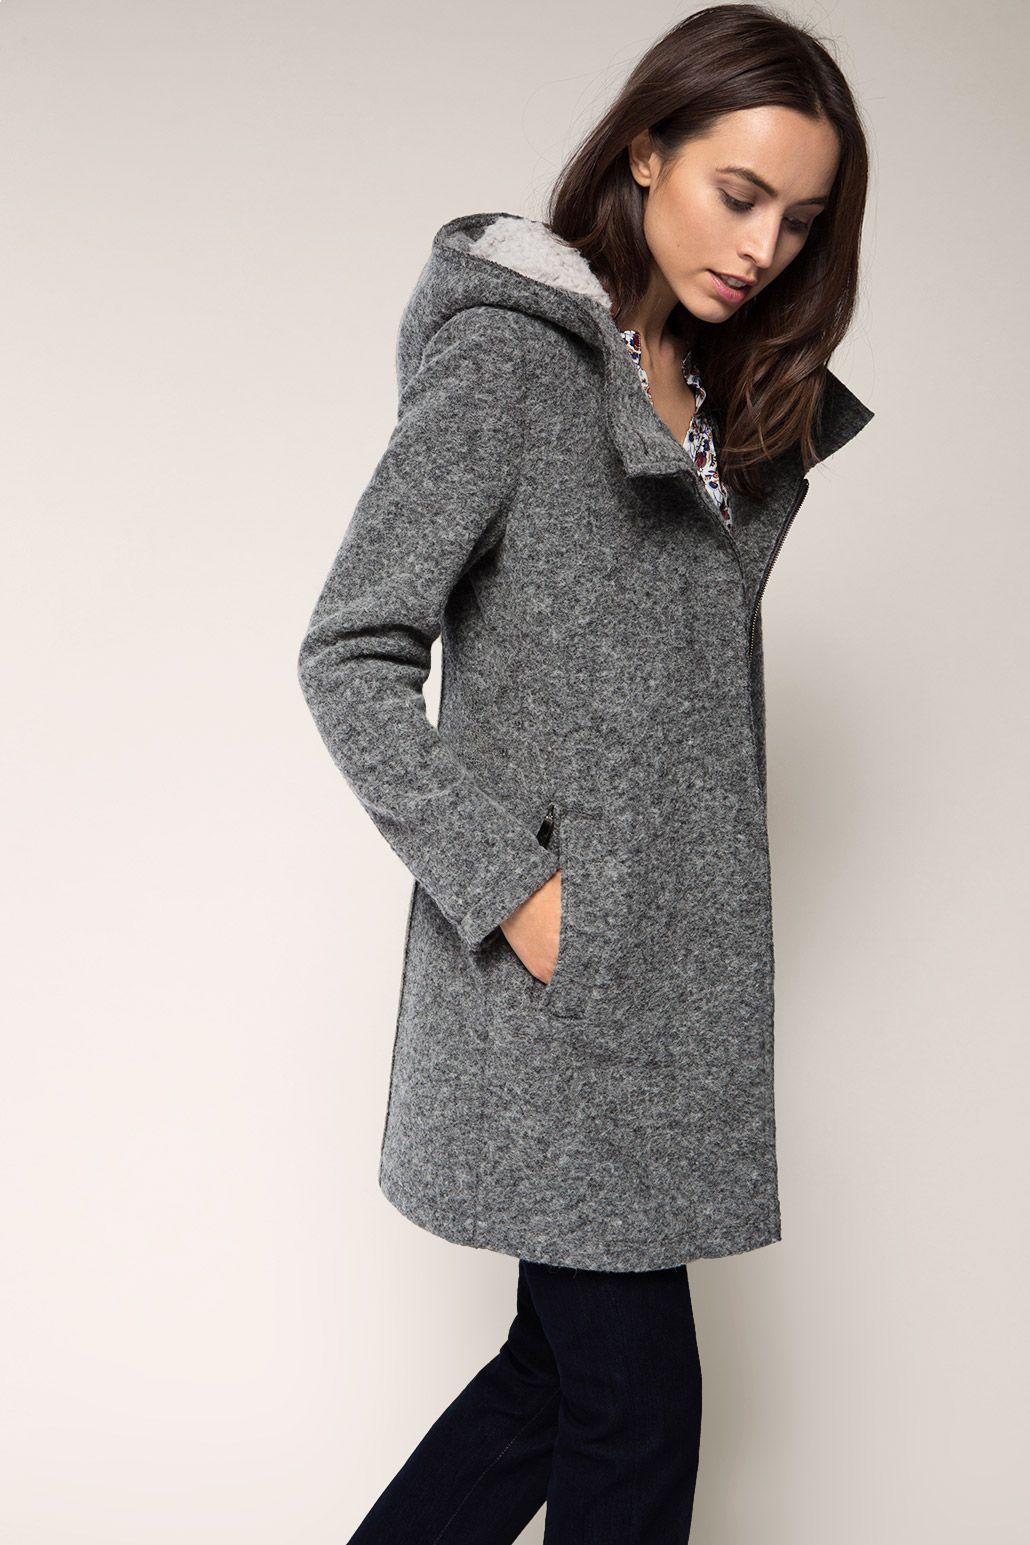 Esprit Mantel aus Woll Mix mit Webfell Kapuze | Mantel mit